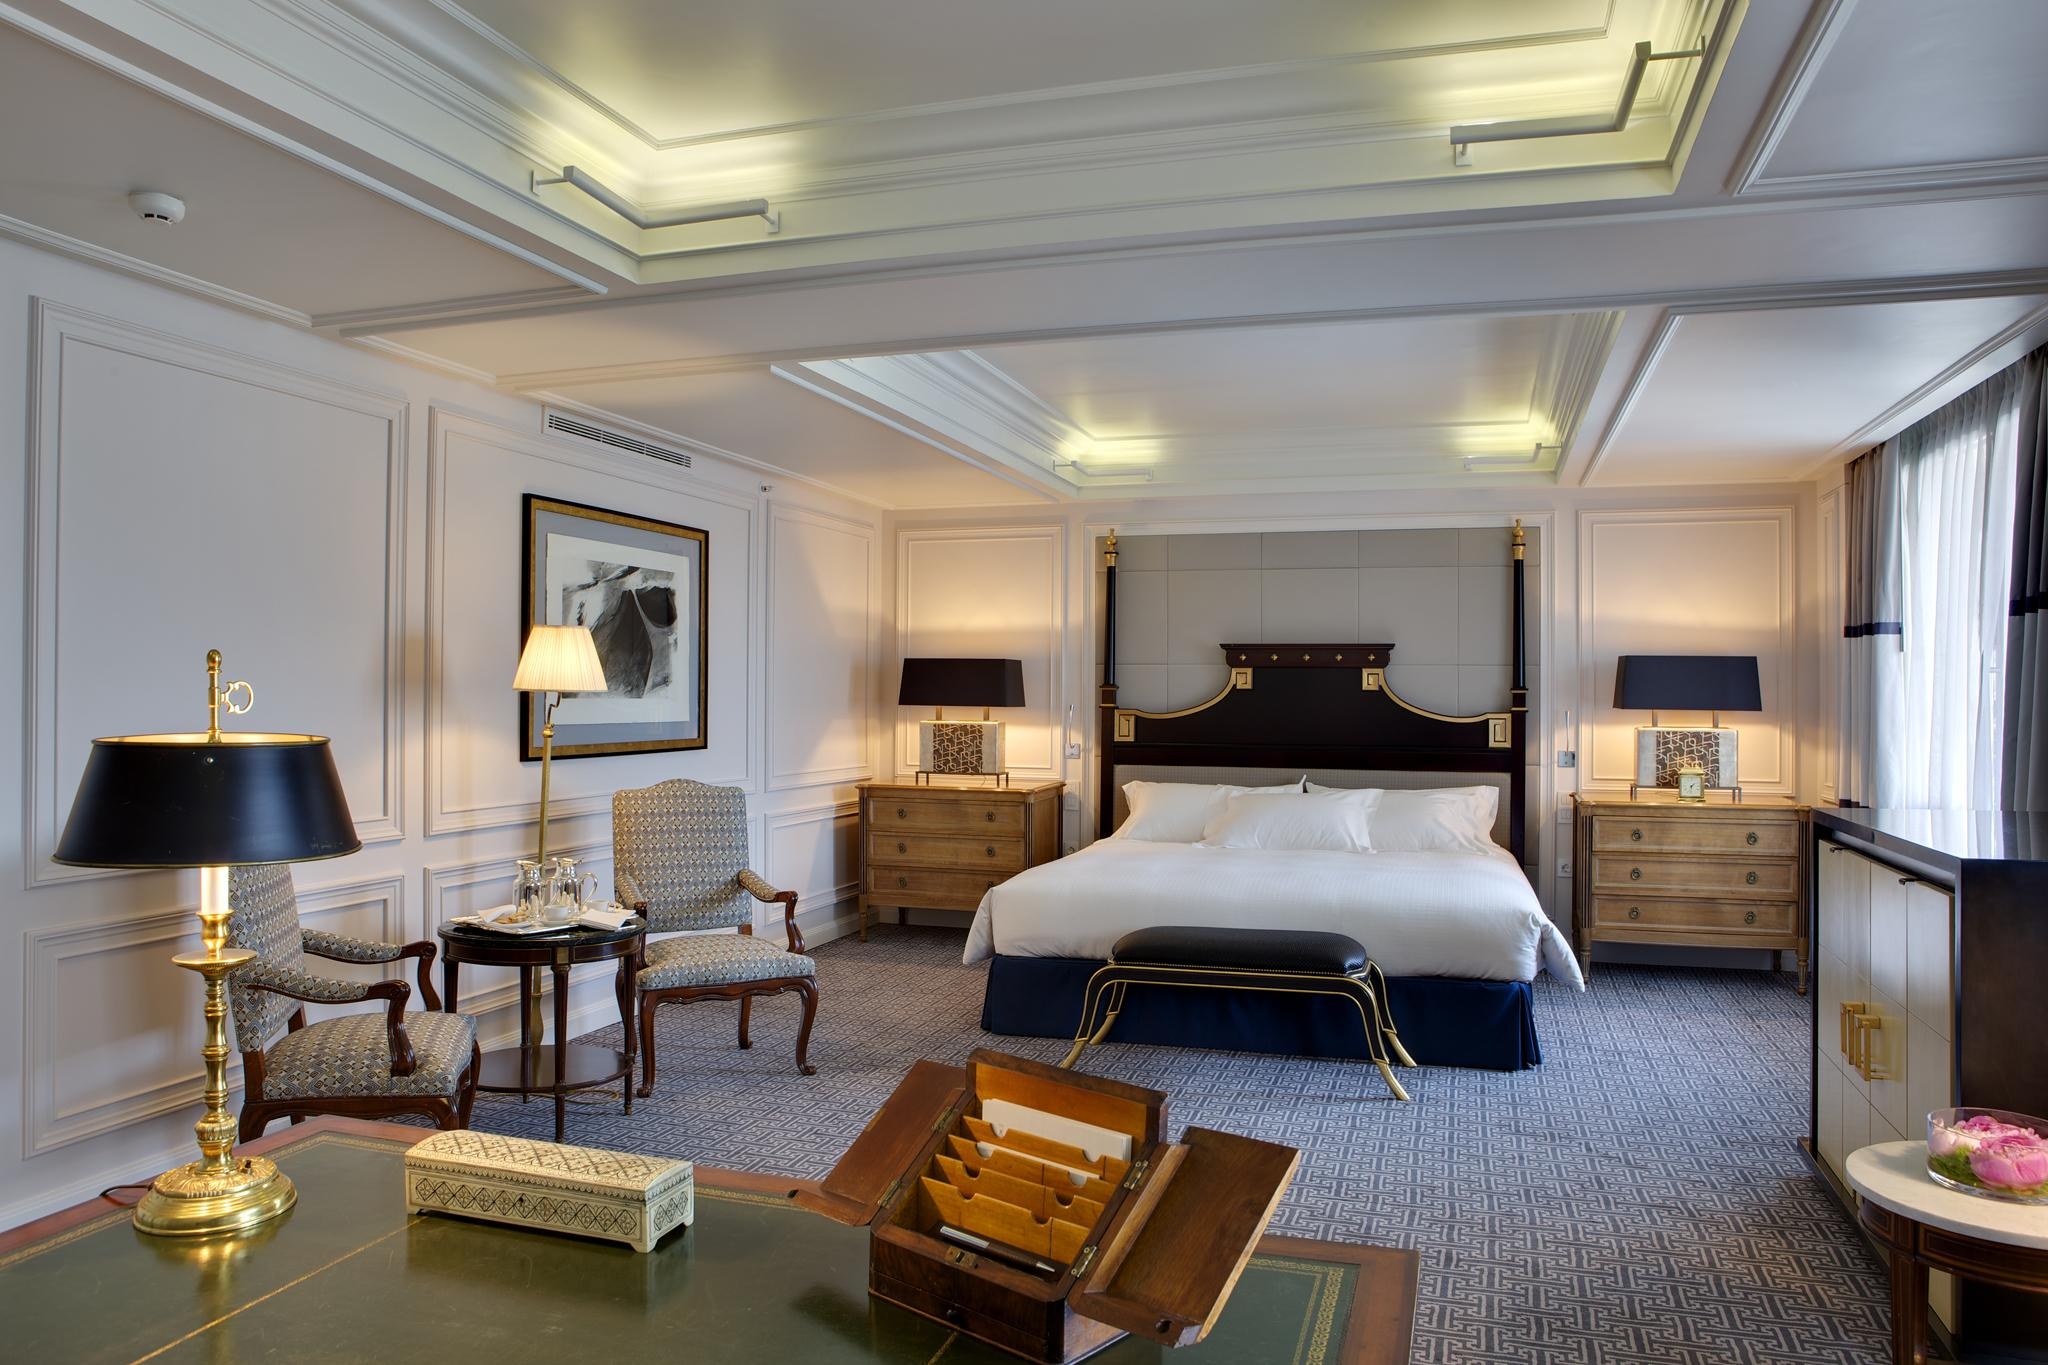 Suite Royal Hotel Villa Magna, Madrid